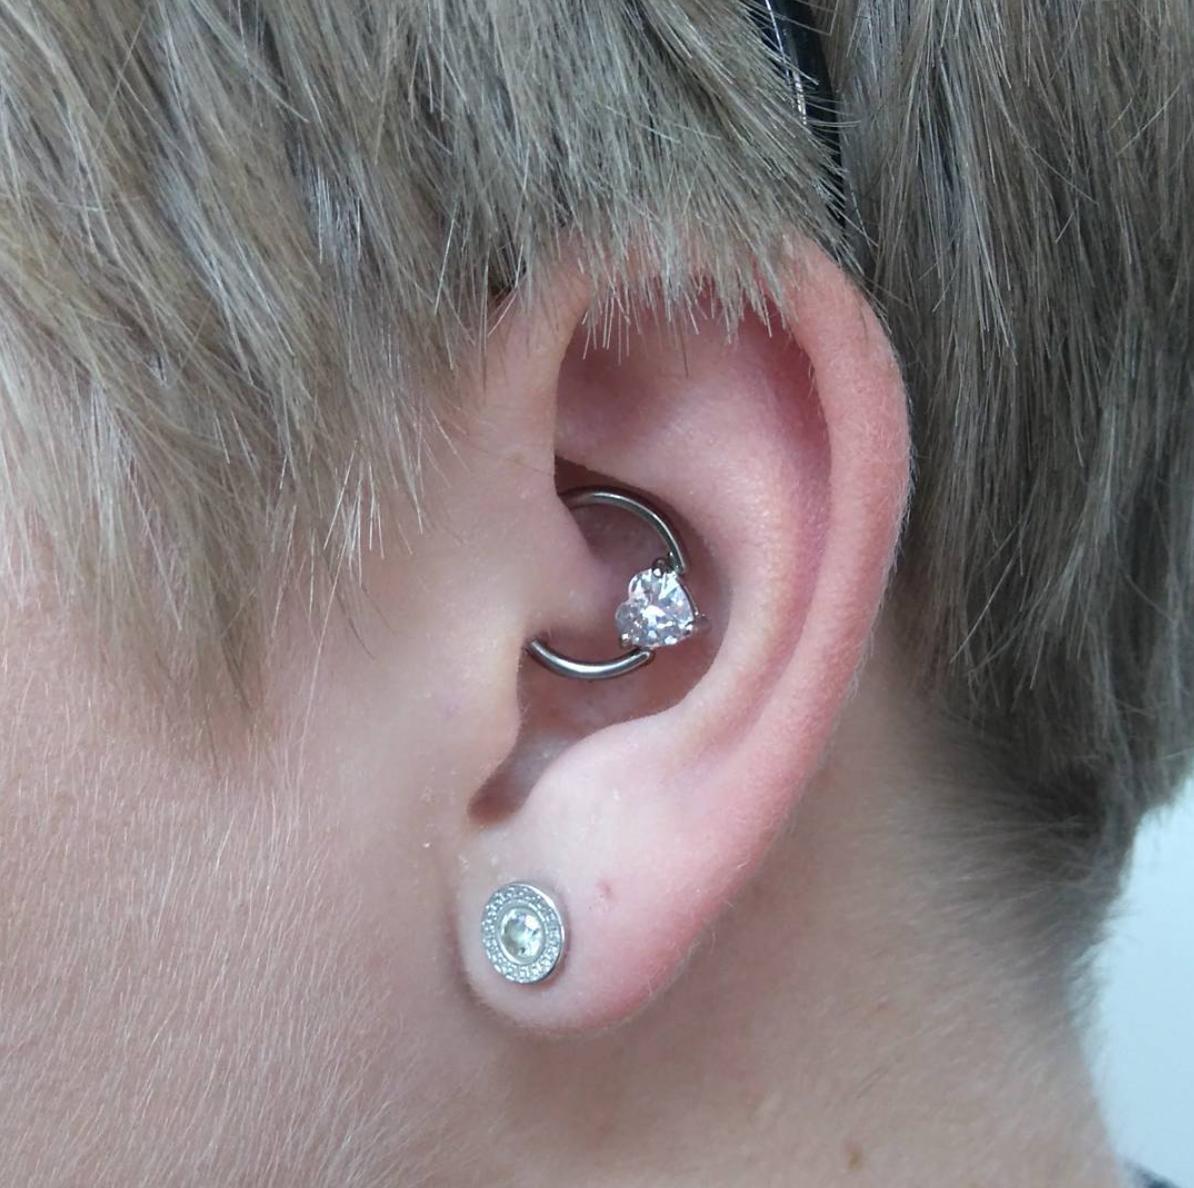 odense piercing